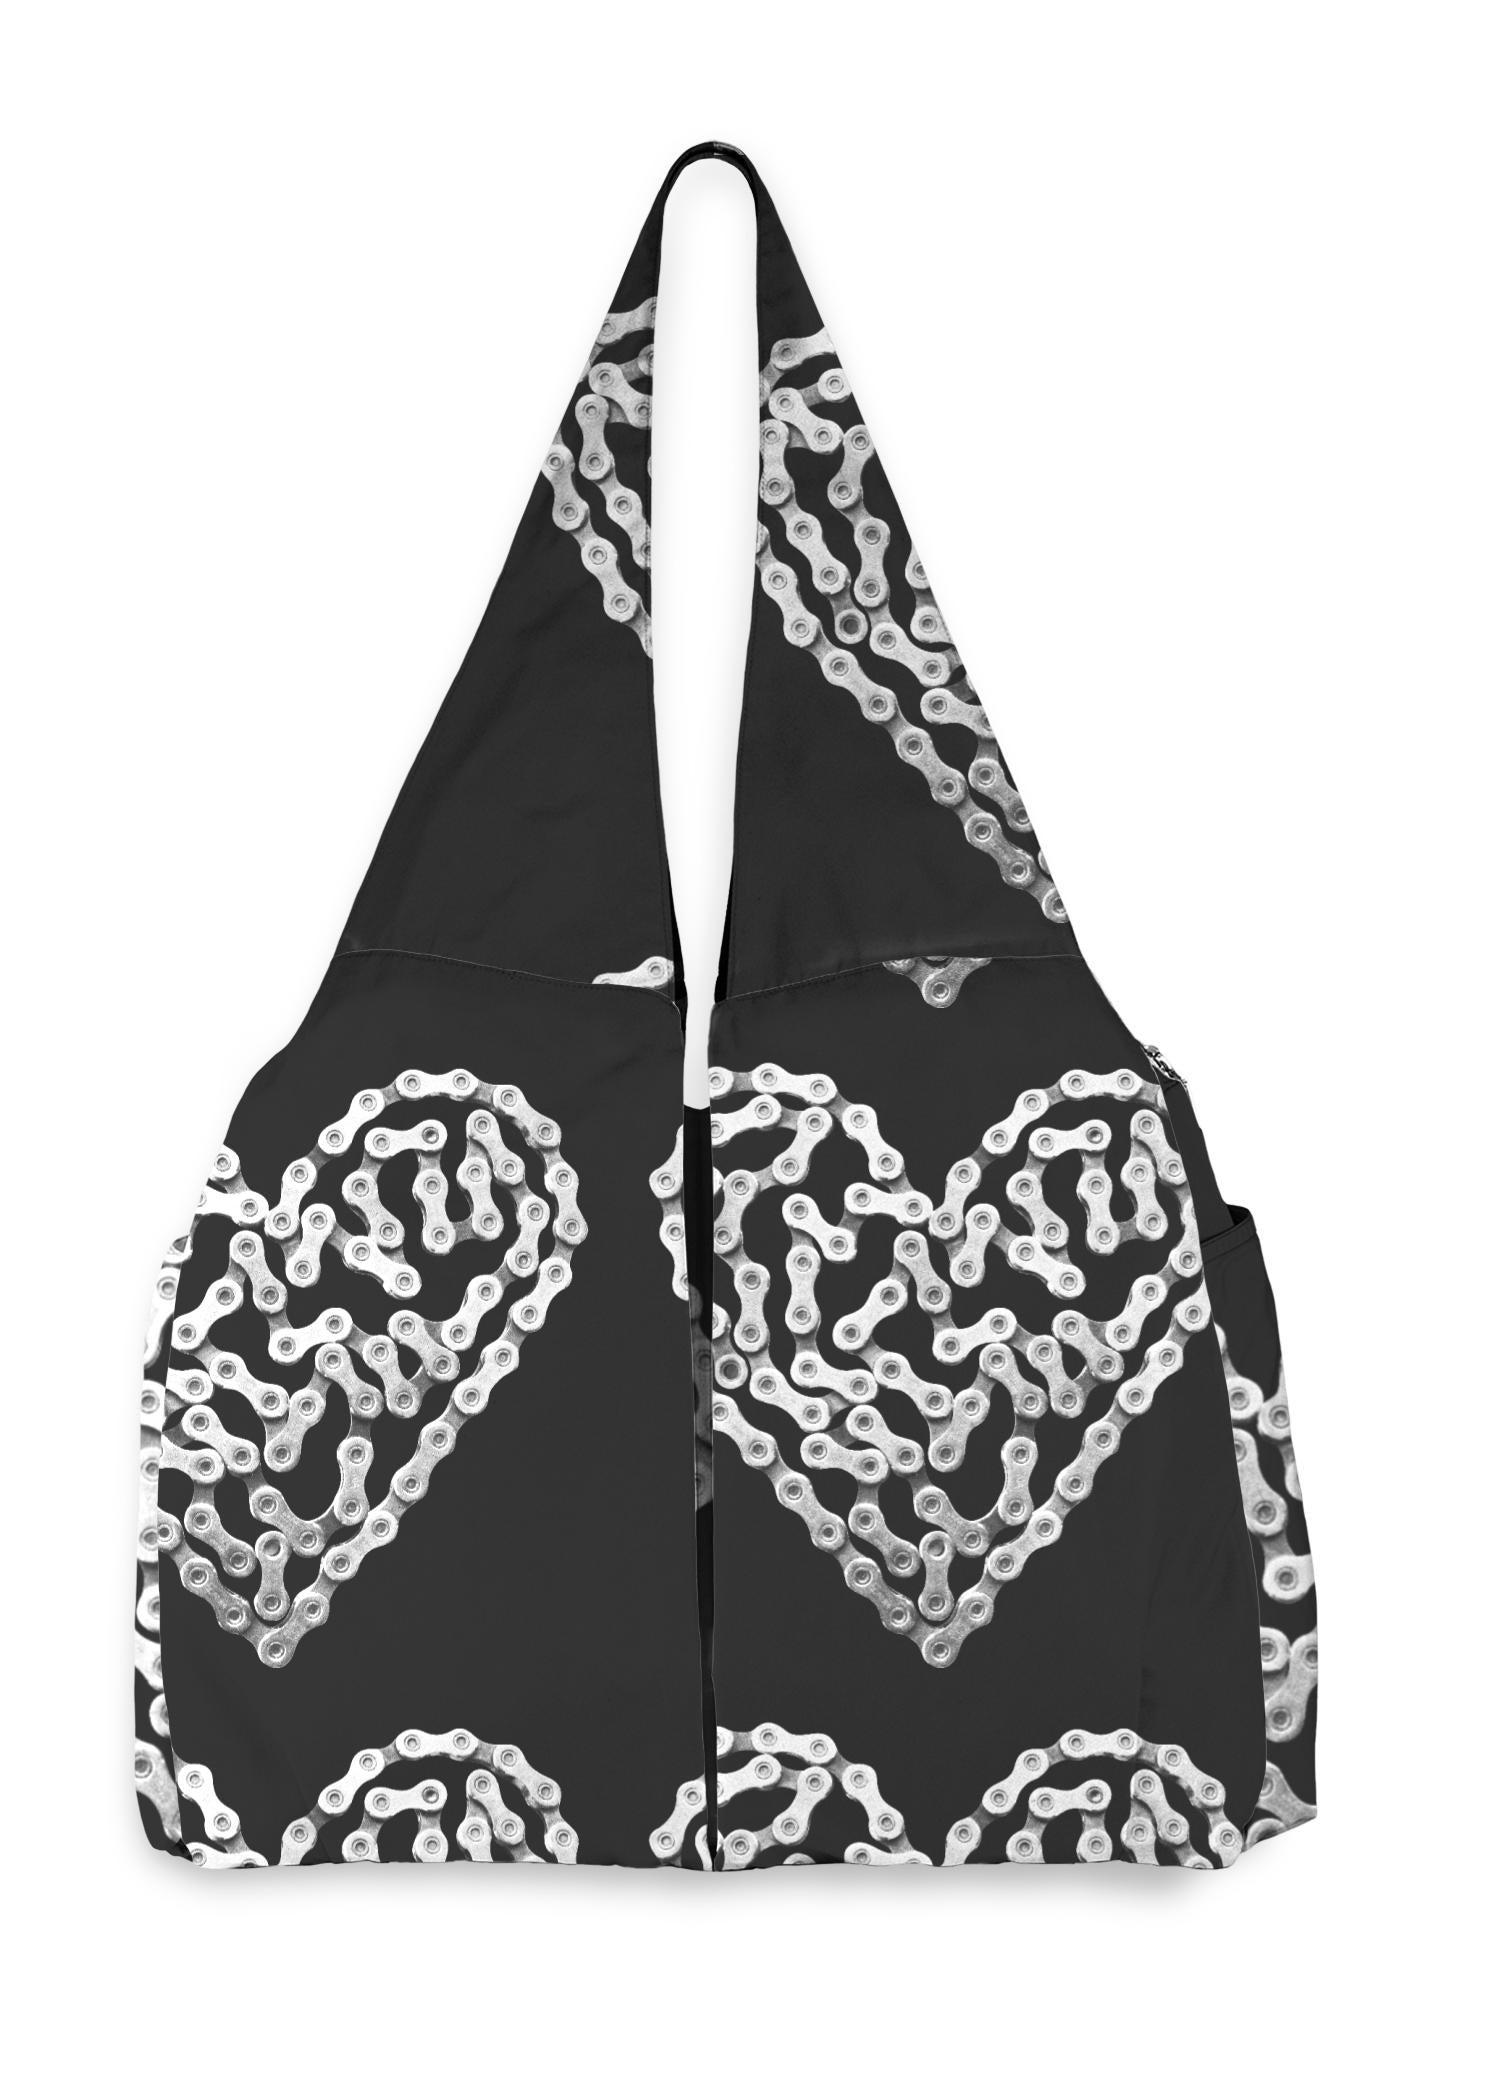 VIDA Studio Bag - Bike Chain Heart by VIDA Original Artist  - Size: One Size